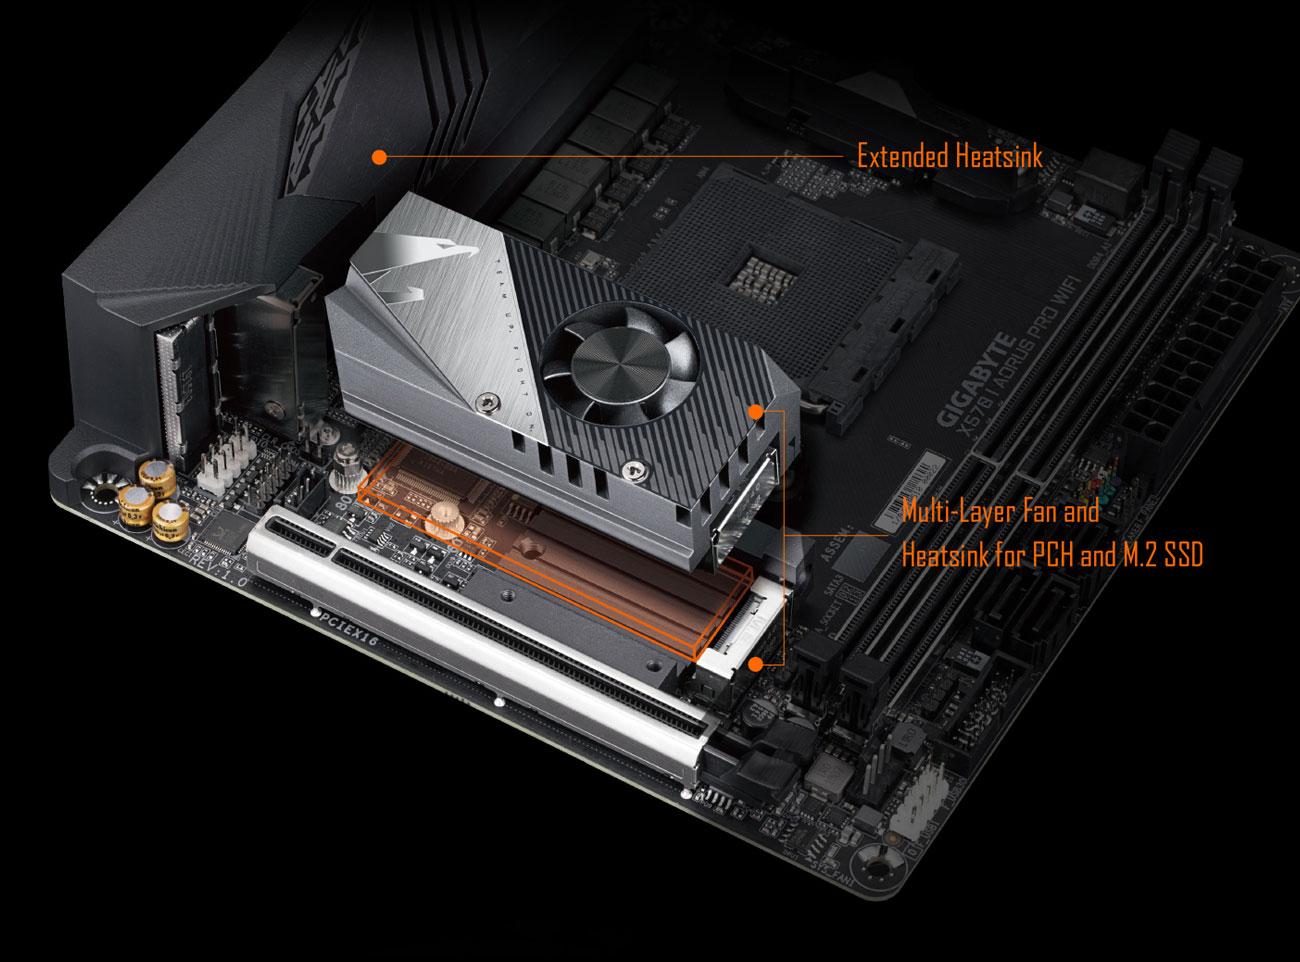 GIGABYTE X570 I AORUS PRO WIFI AMD Ryzen 3000 PCIe 4 0 SATA 6Gb/s USB 3 2  AMD X570 Mini-ITX Motherboard - Newegg com